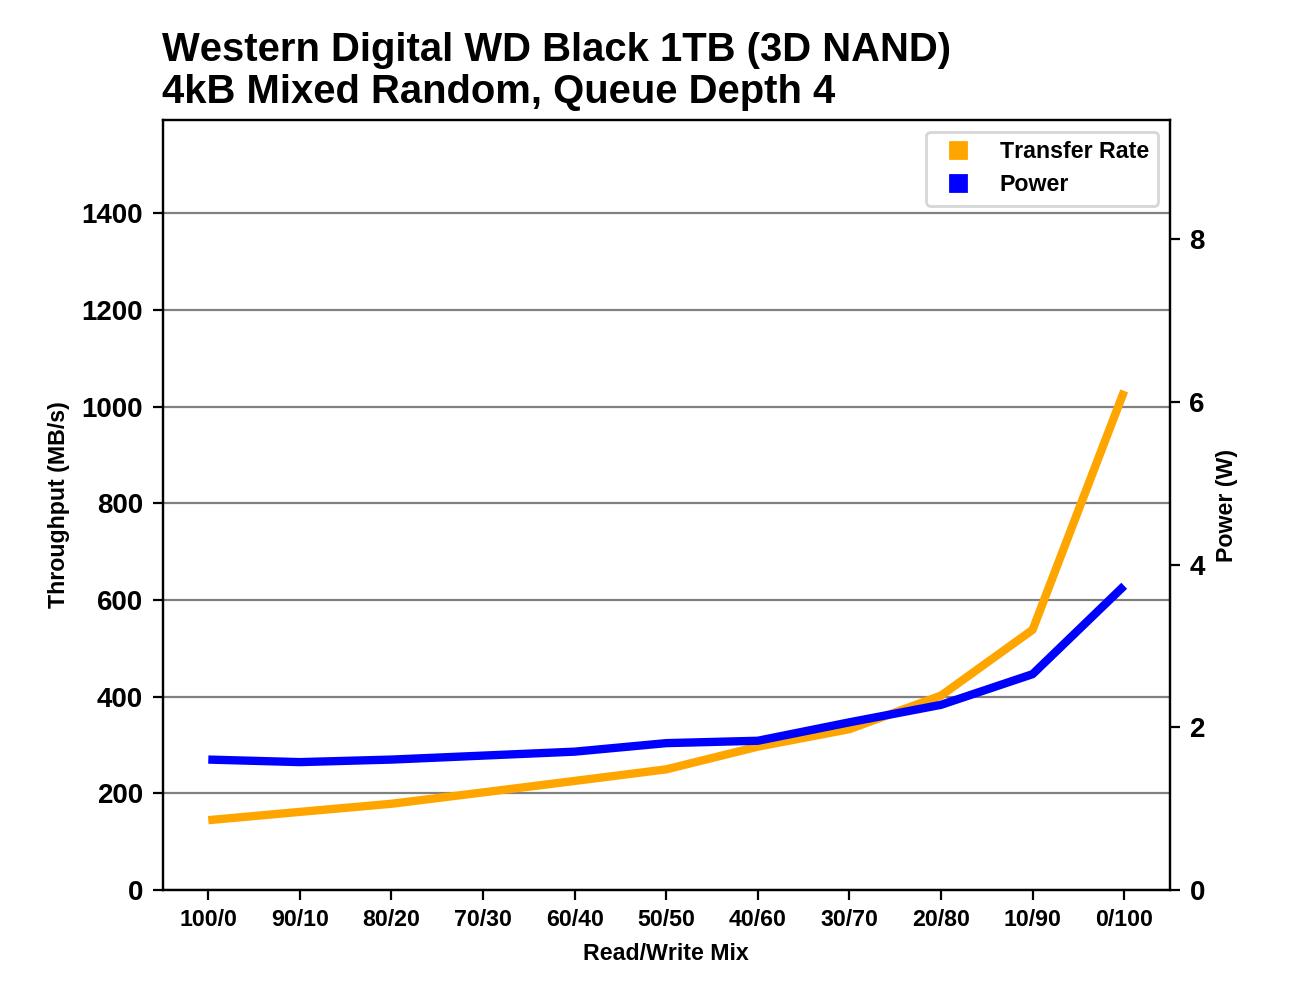 Обзор Western Digital WD Black 3D NAND SSD: EVO встретил равного - 113